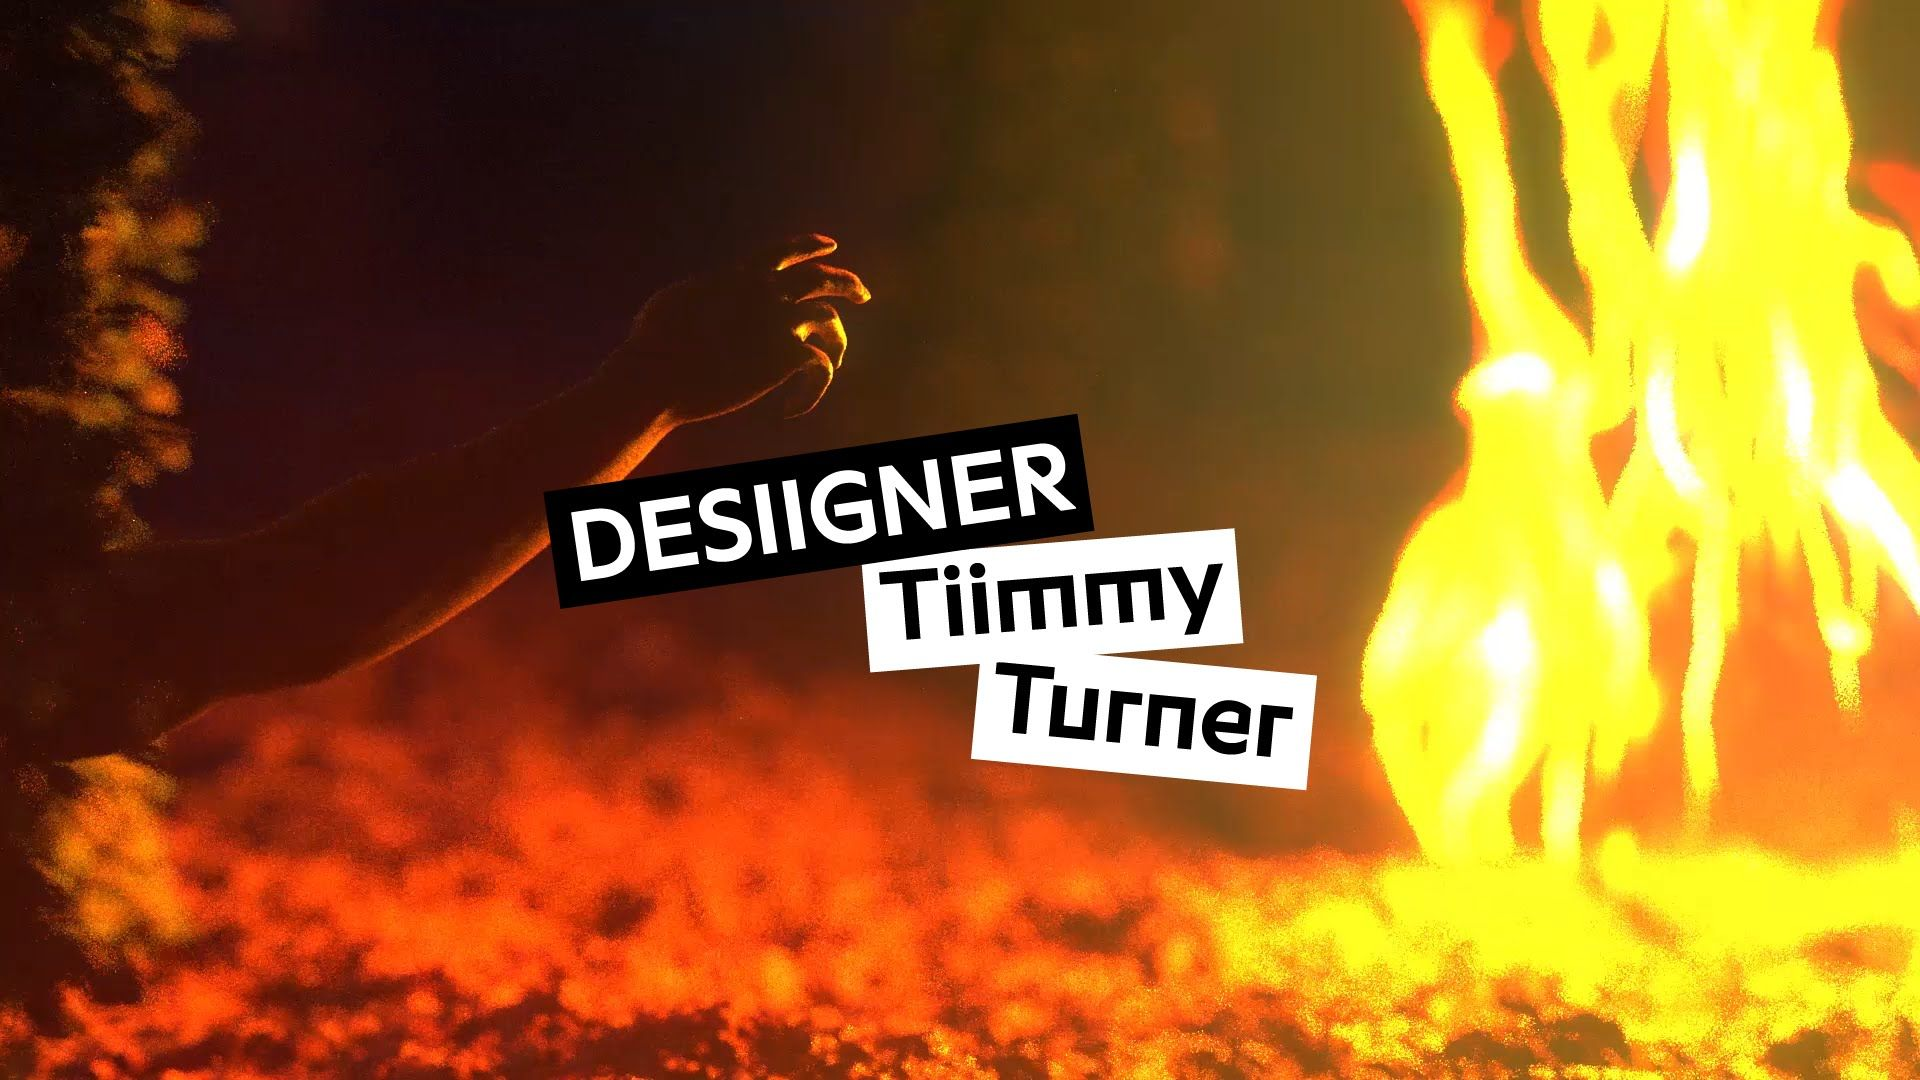 Desiigner Tiimmy Turner Official Timmy Turner Lyrics Lyrics Turner Song Lyrics